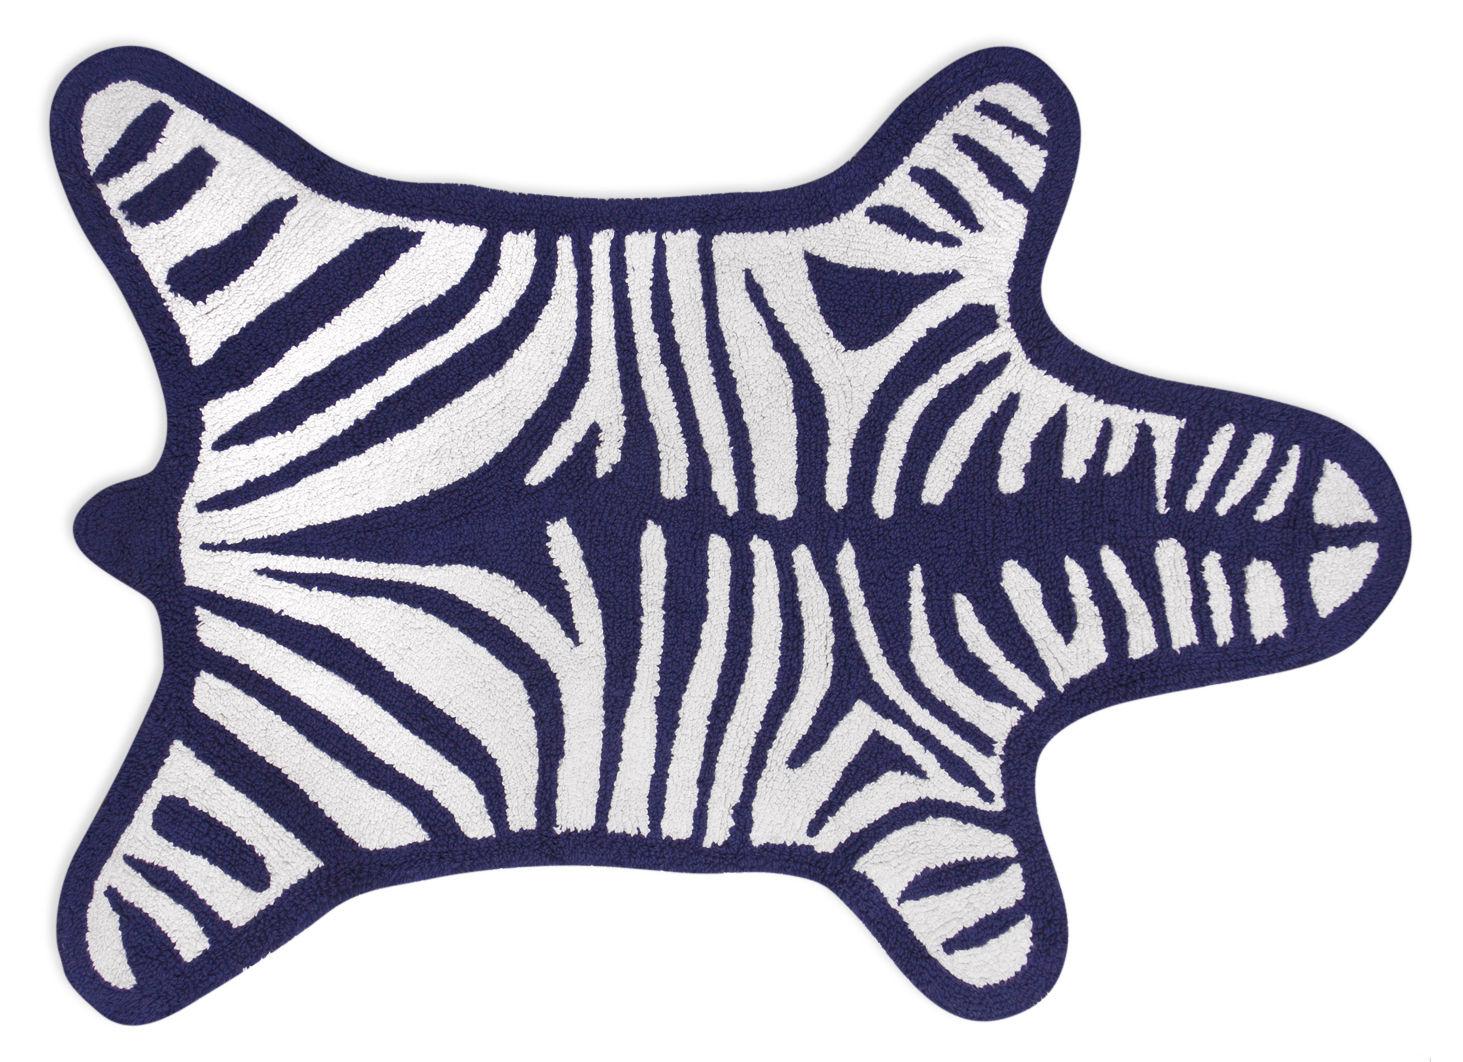 Accessories - Bathroom Accessories - Zebra Bath mat - Reversible - 112 x 79 cm by Jonathan Adler - White / Blue navy - Cotton